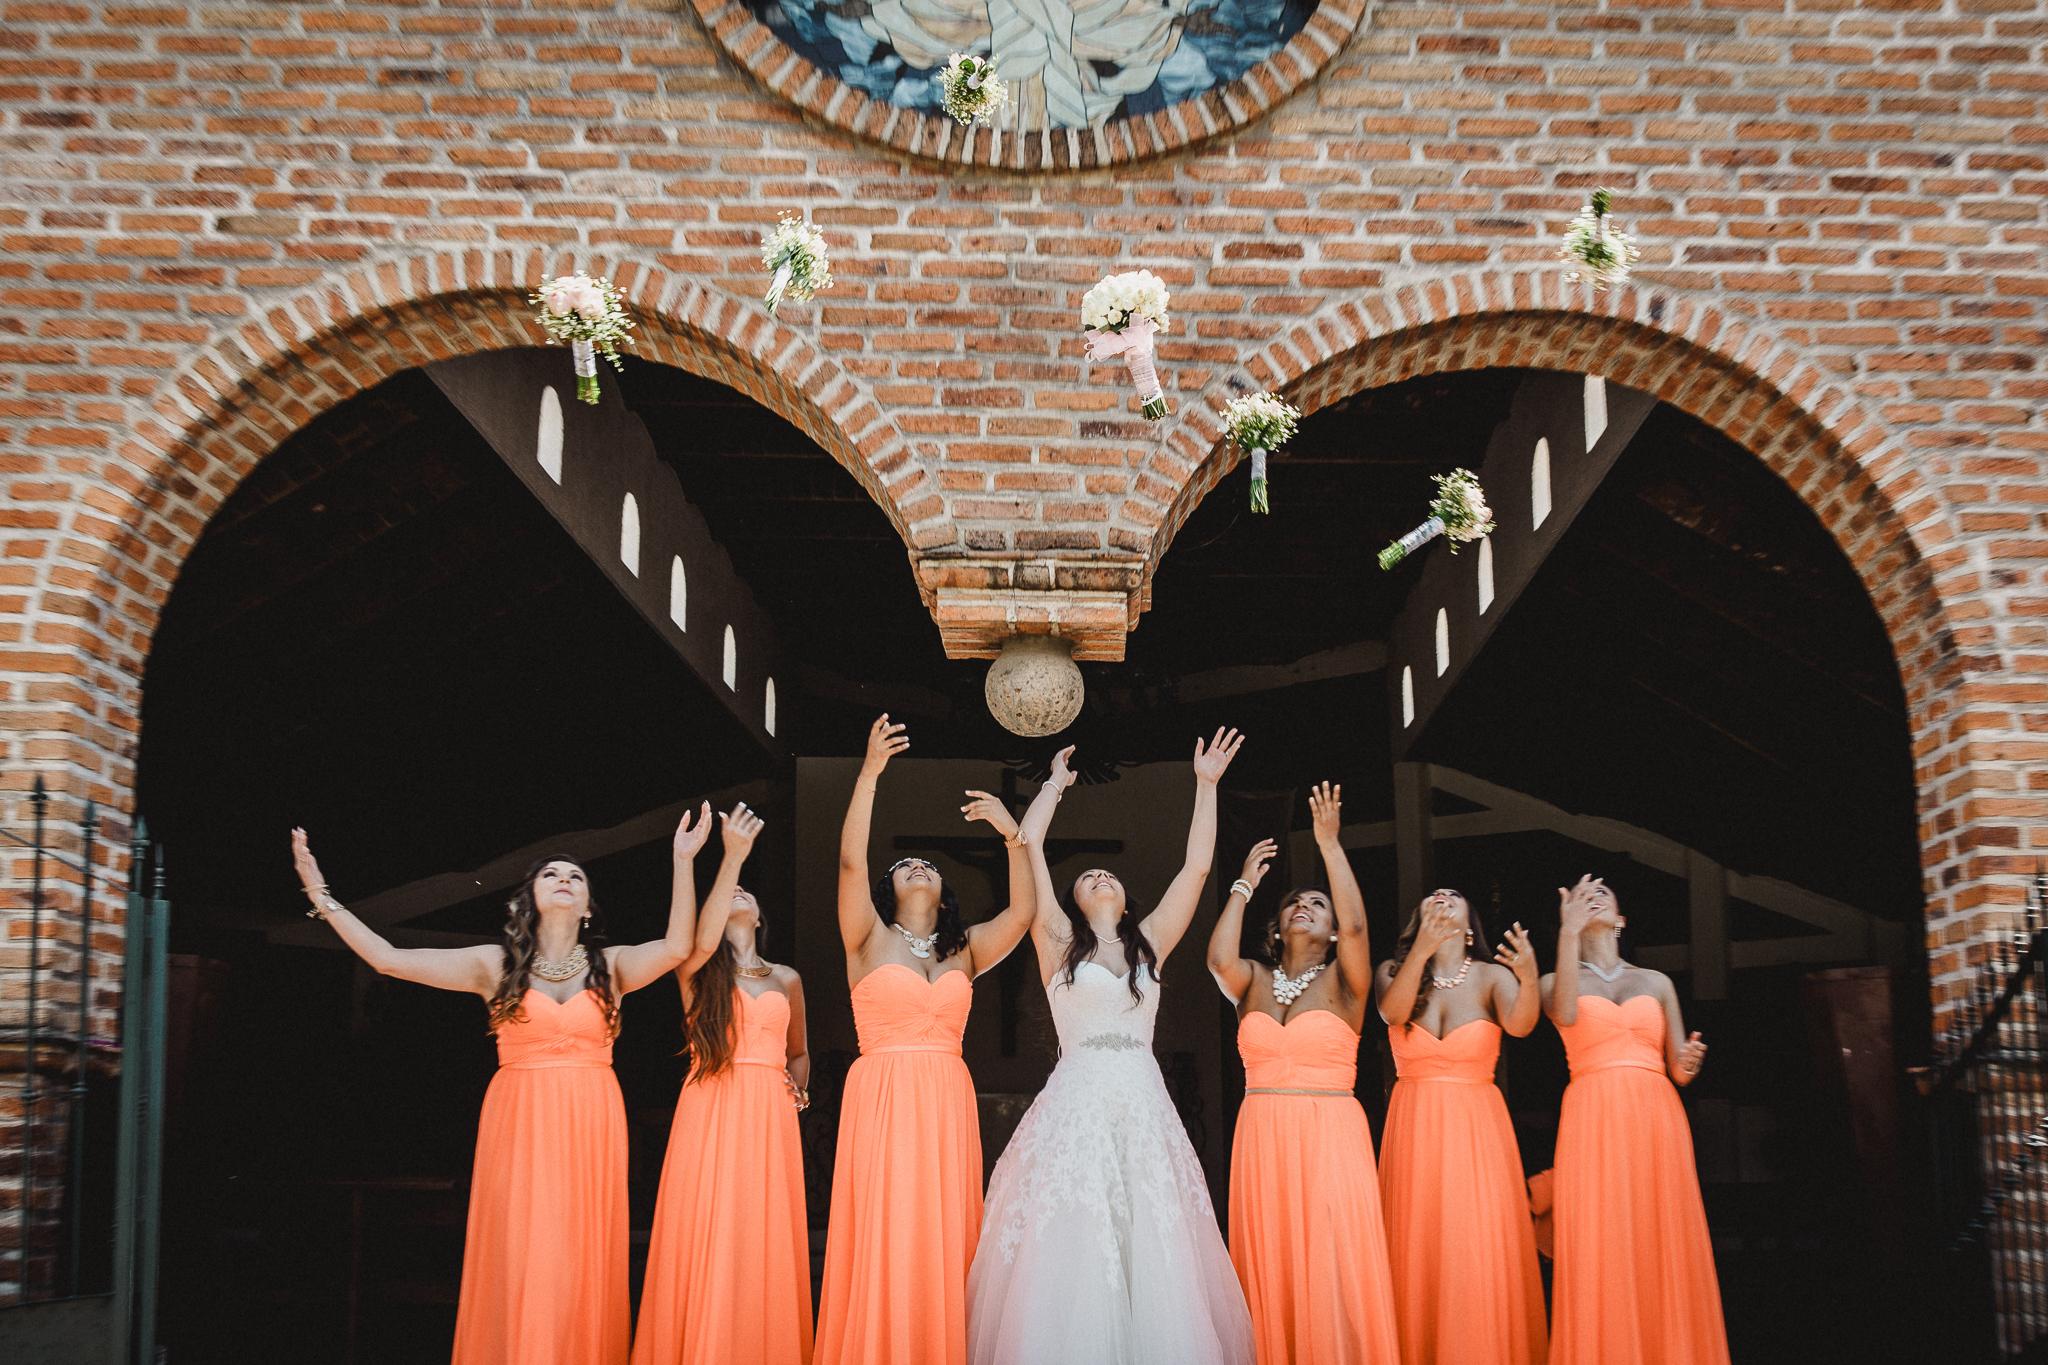 Sesion de fotos divertidas para novia y damas de honor. Aventando ramo. Alan Robles Fotografo de Bodas